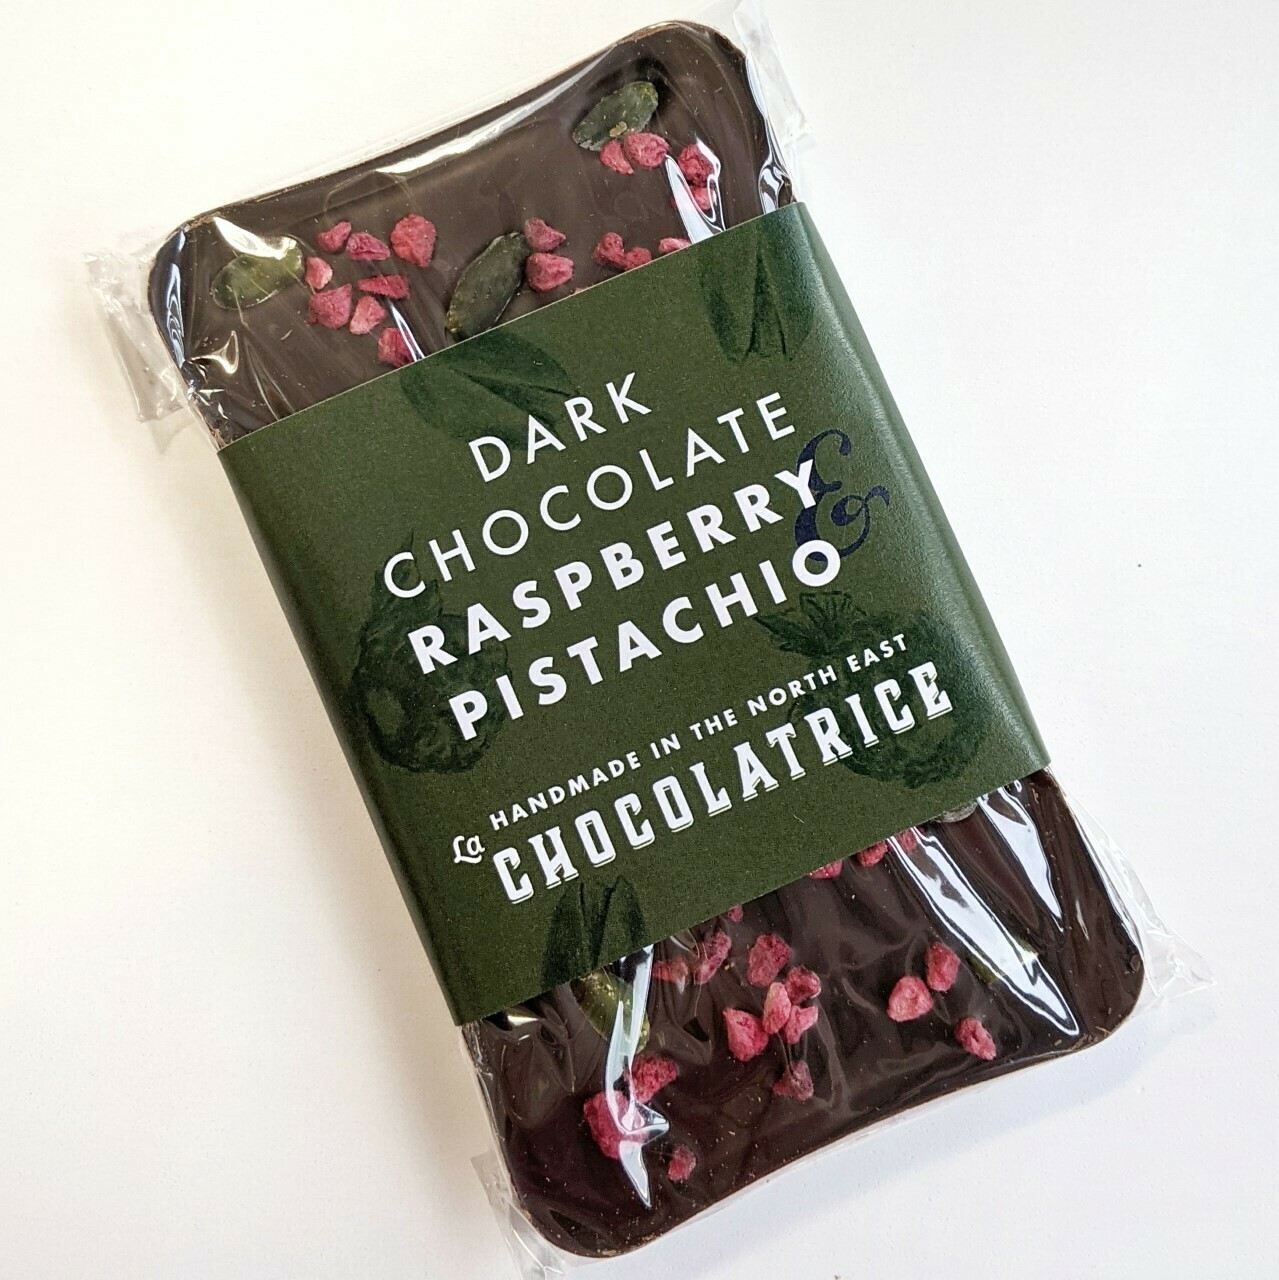 Dark Chocolate 55% Raspberry and Pistachio Bar (dairy-free)